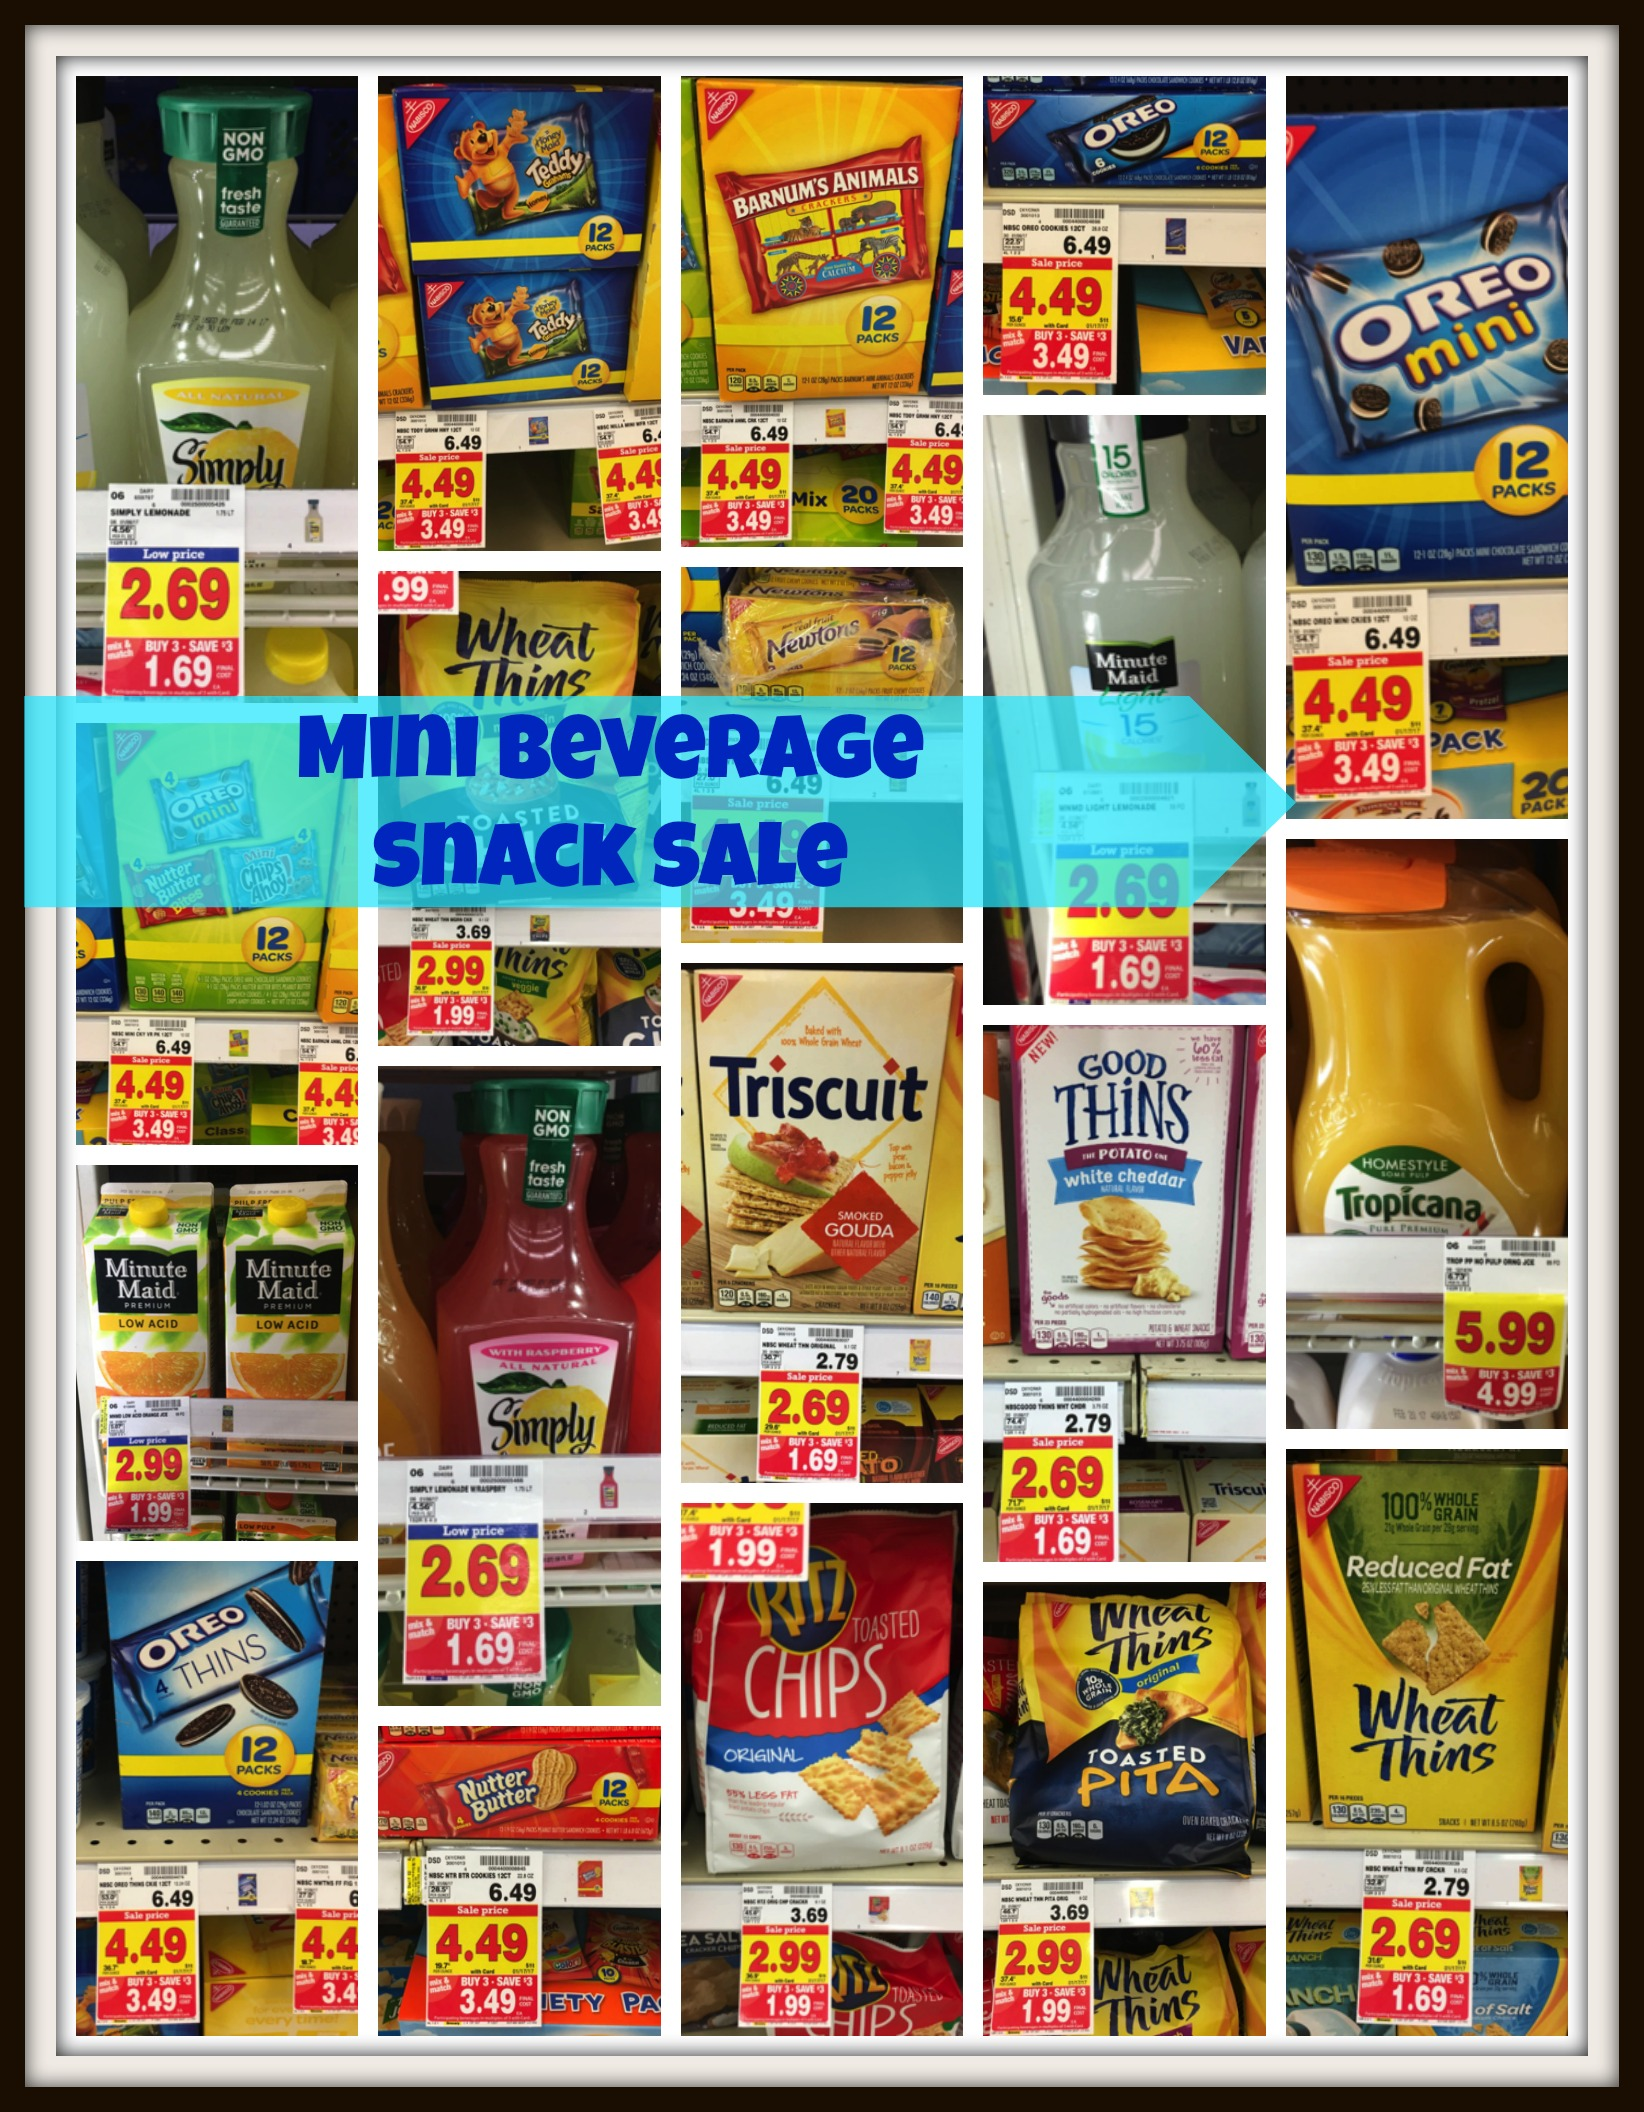 mini-beverage-sale-image